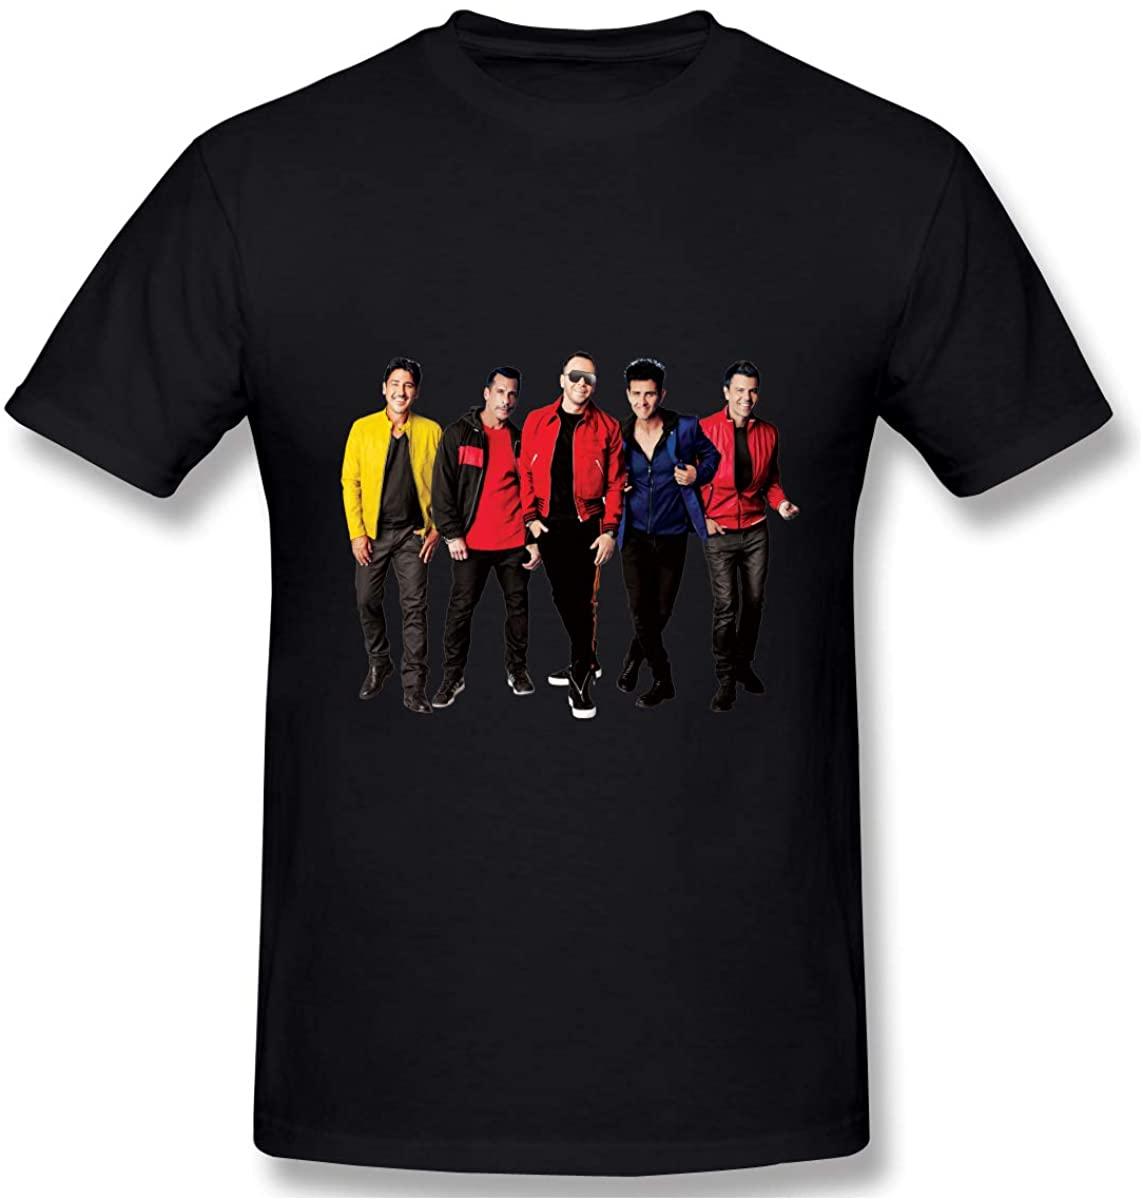 Hbokink New Kids On The Block Men's Athletic Men's Cotton Short Sleeve T-Shirt Black